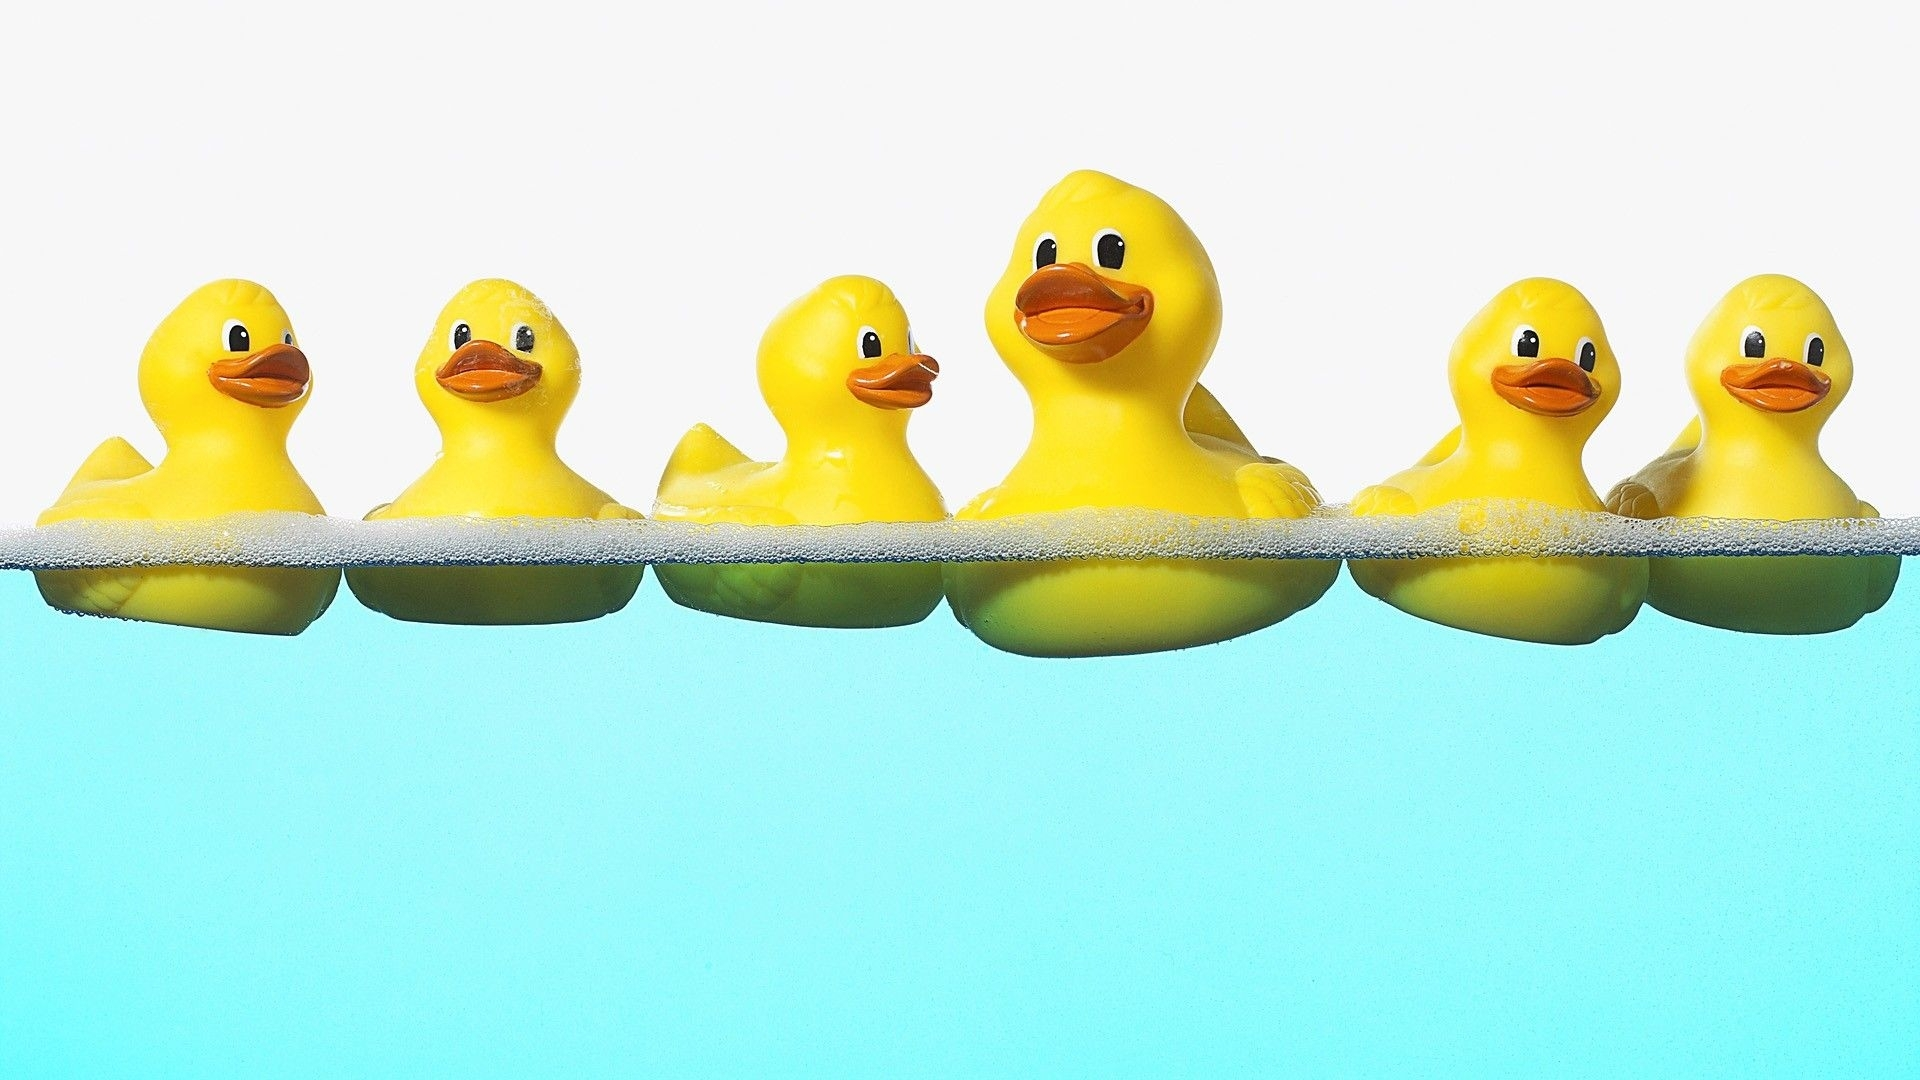 download rubber ducks wallpaper 1920x1080 | full hd wallpapers